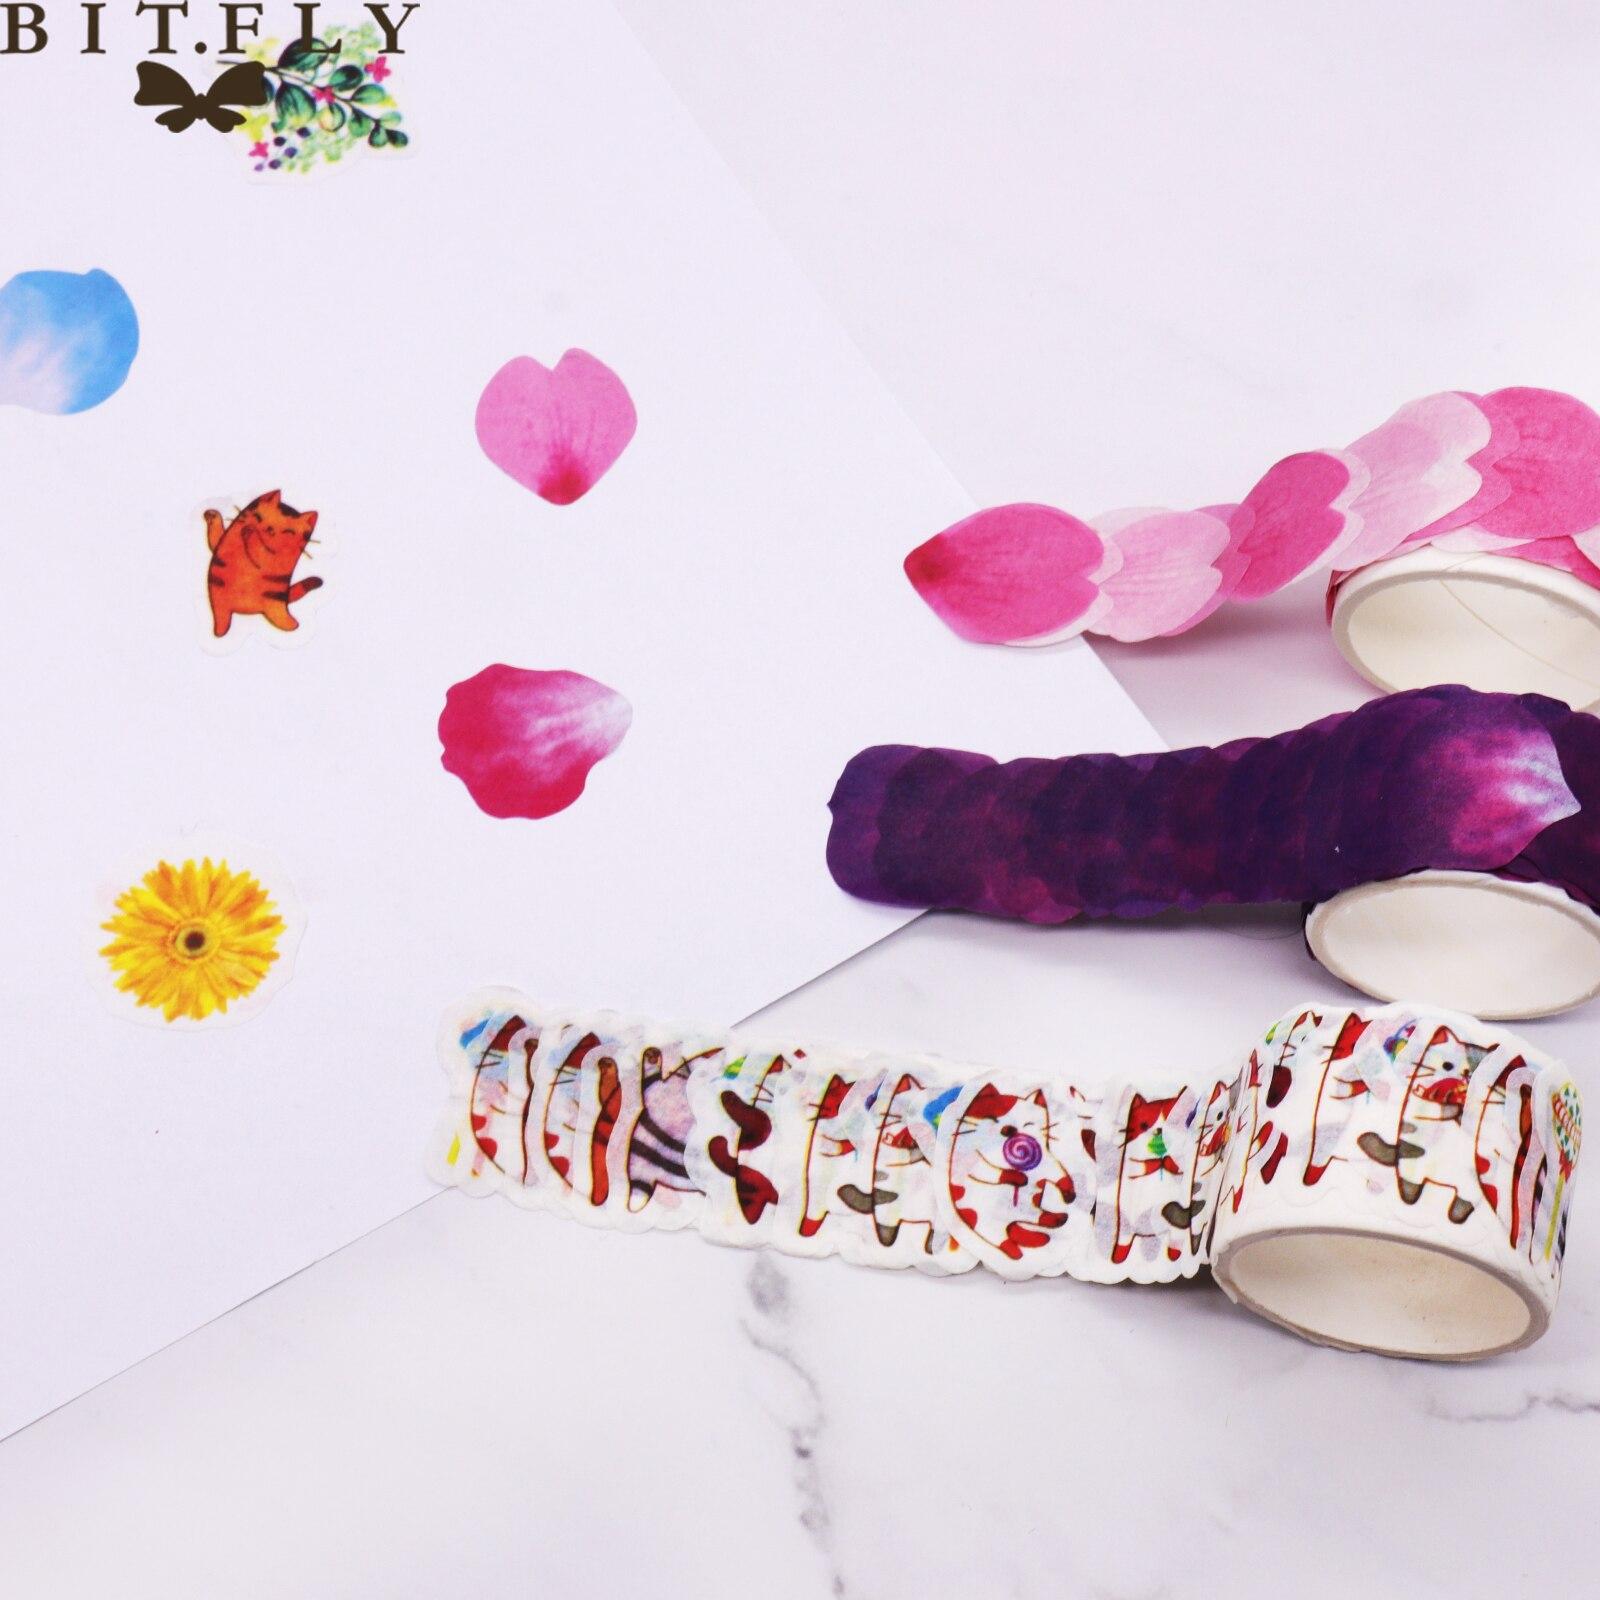 Flower Petals Washi Tape Decorative Masking Tape Fragrance Sakura Washi Tape Scrapbooking Diary Paper Stickers DIY Accessories